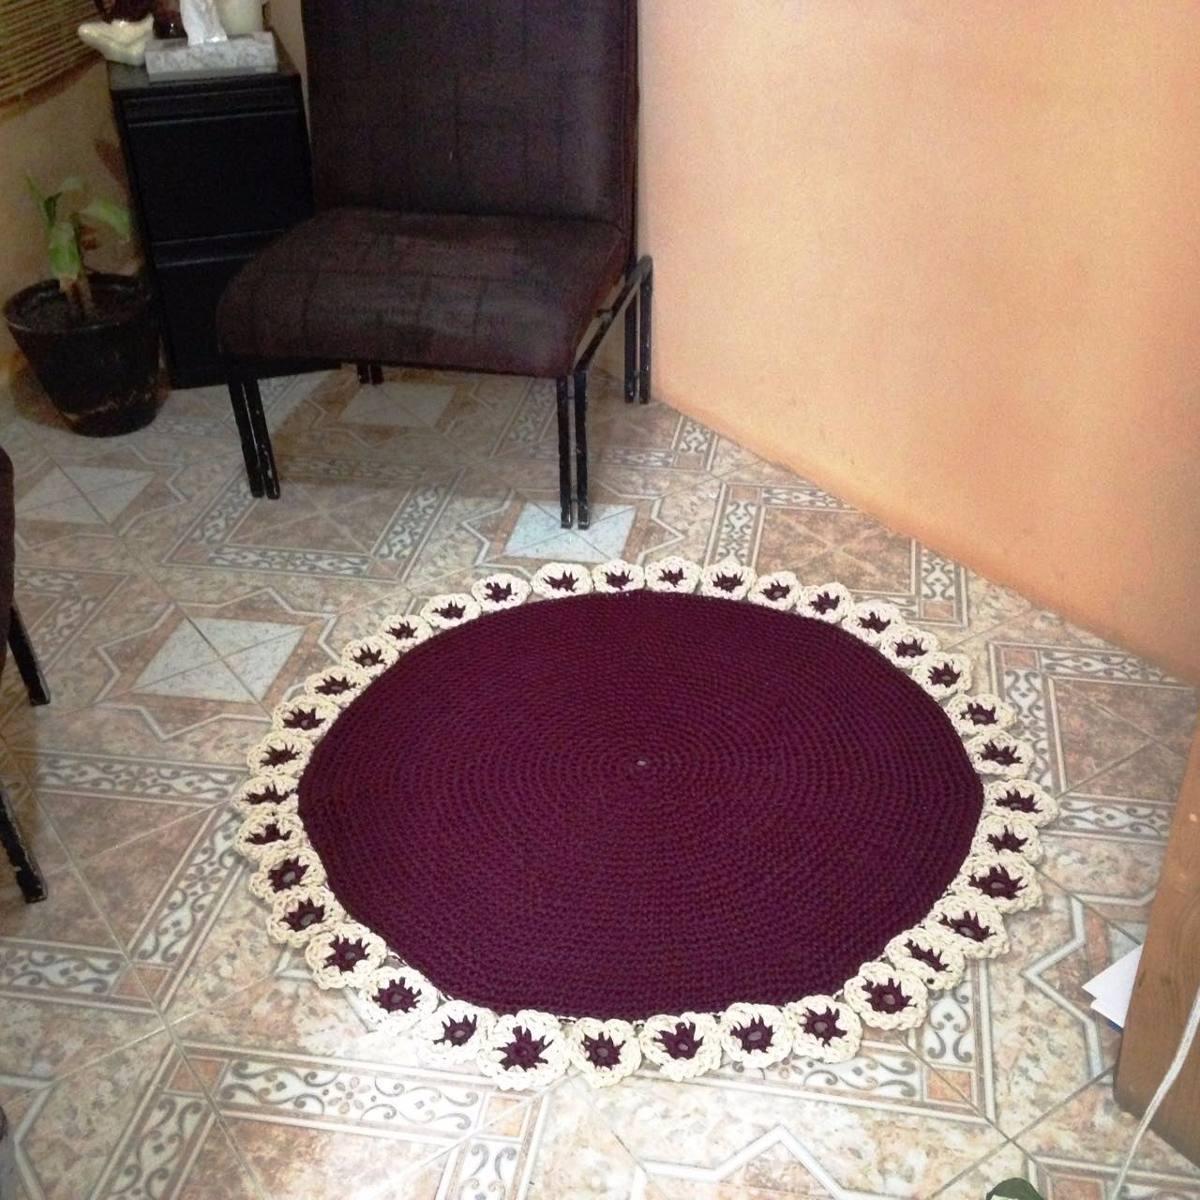 Tapetes Tejidos En Crochet Tapetes En Mercado Libre M Xico -> Tapetes Para Sala Tejidos A Crochet